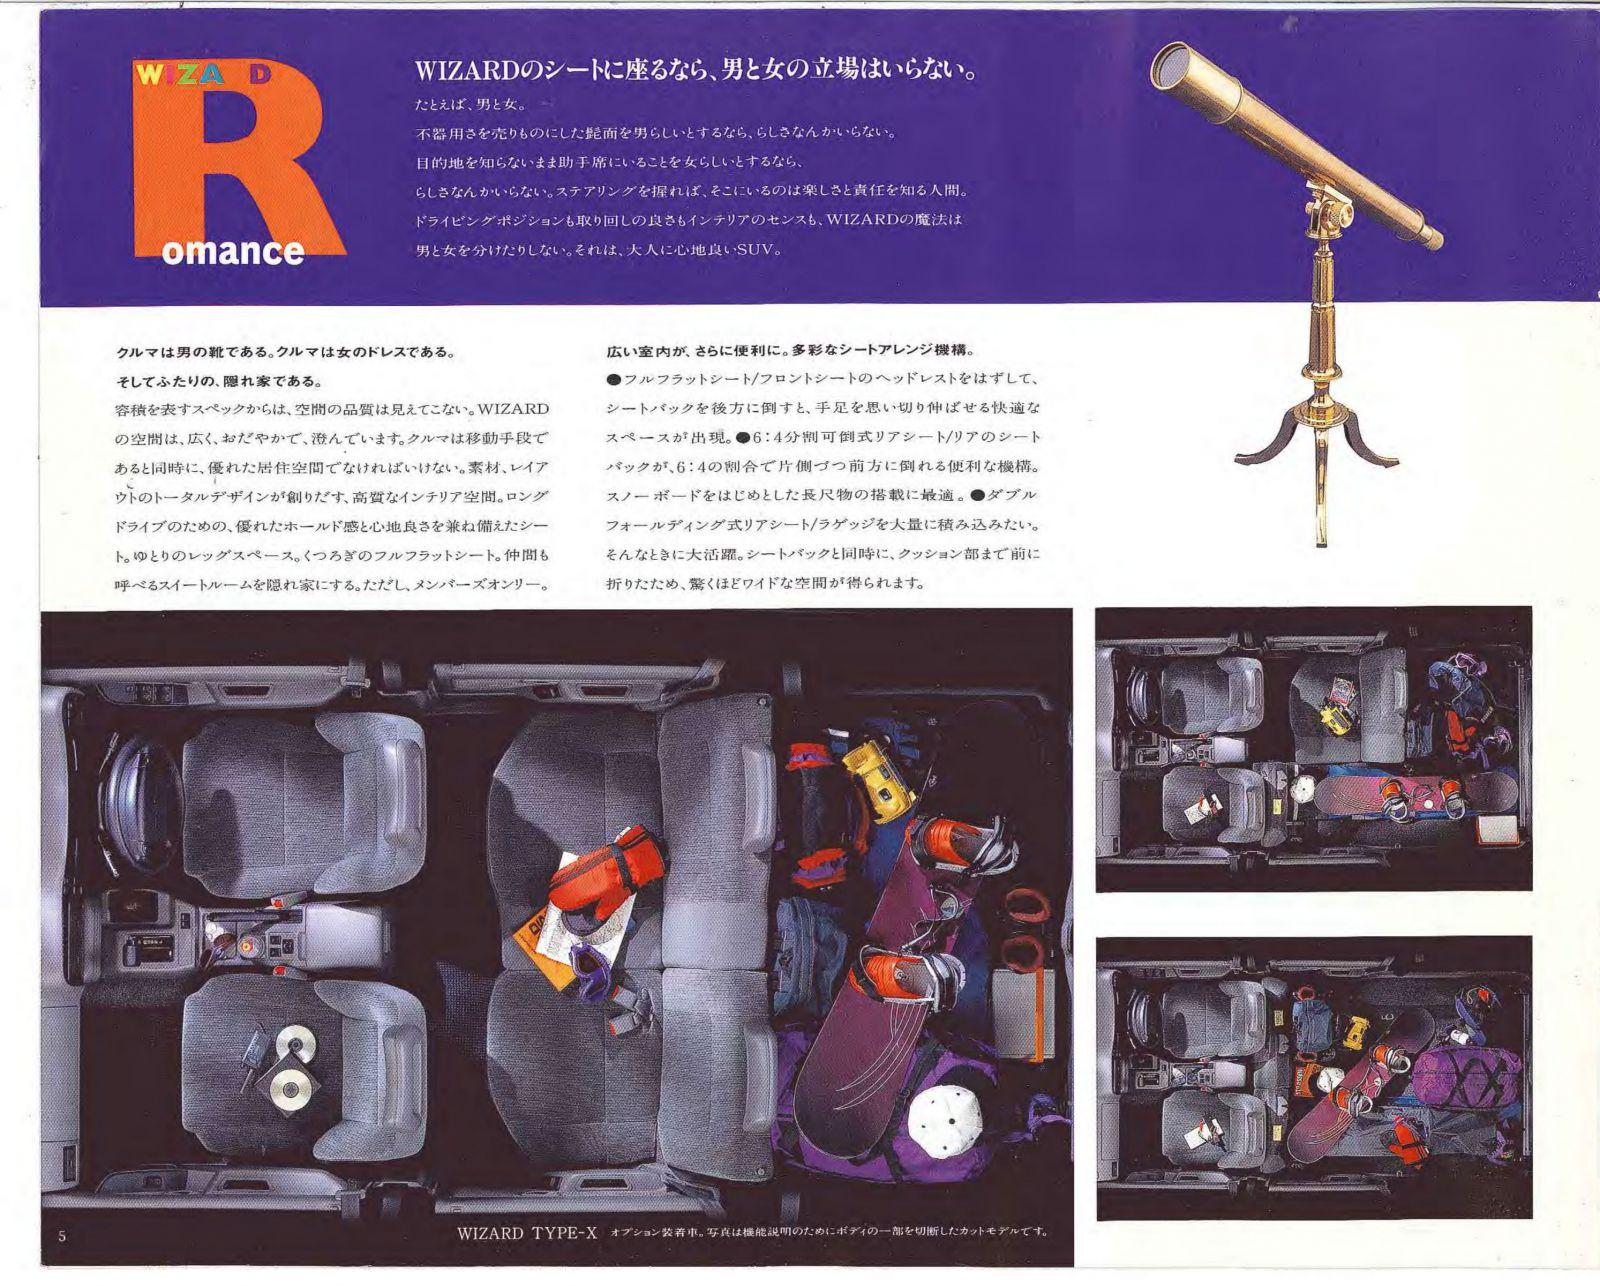 Isuzu Mu Wizard 1995_Page6.jpg